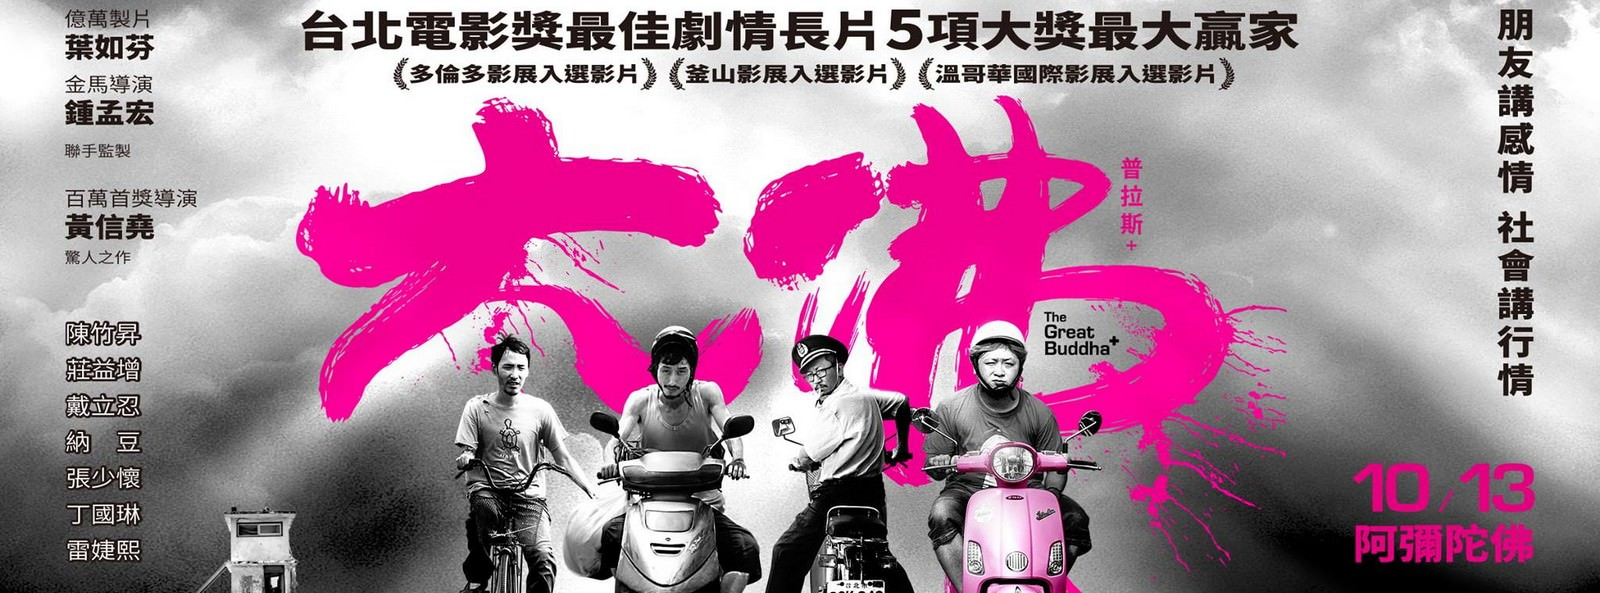 Movie, 大佛普拉斯(台灣, 2017年) / The Great Buddha+(英文), 電影海報, 台灣, 橫版(非正式)